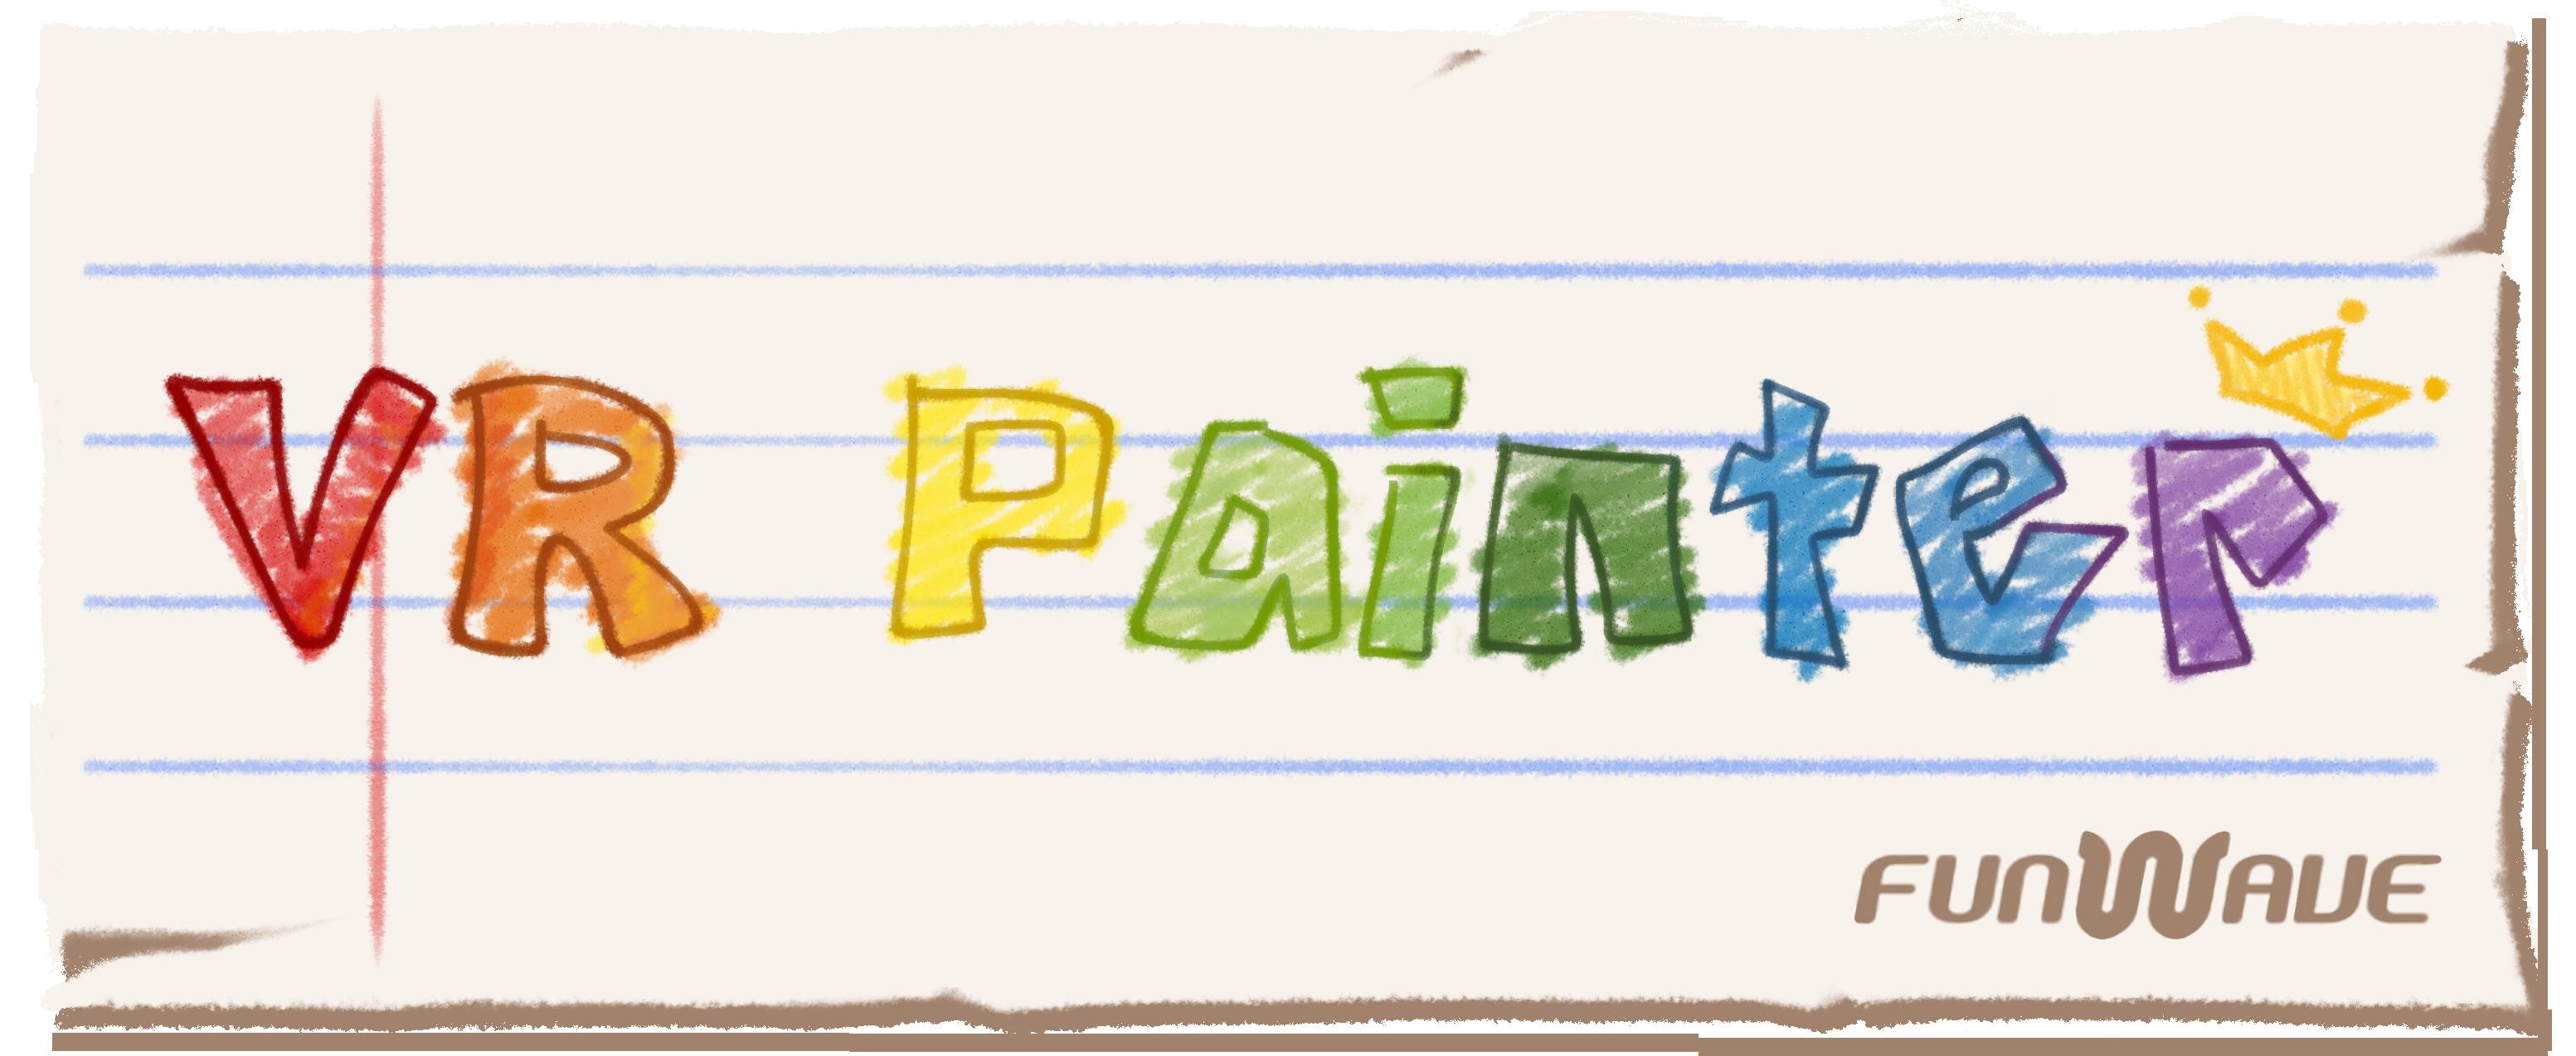 VR Painter